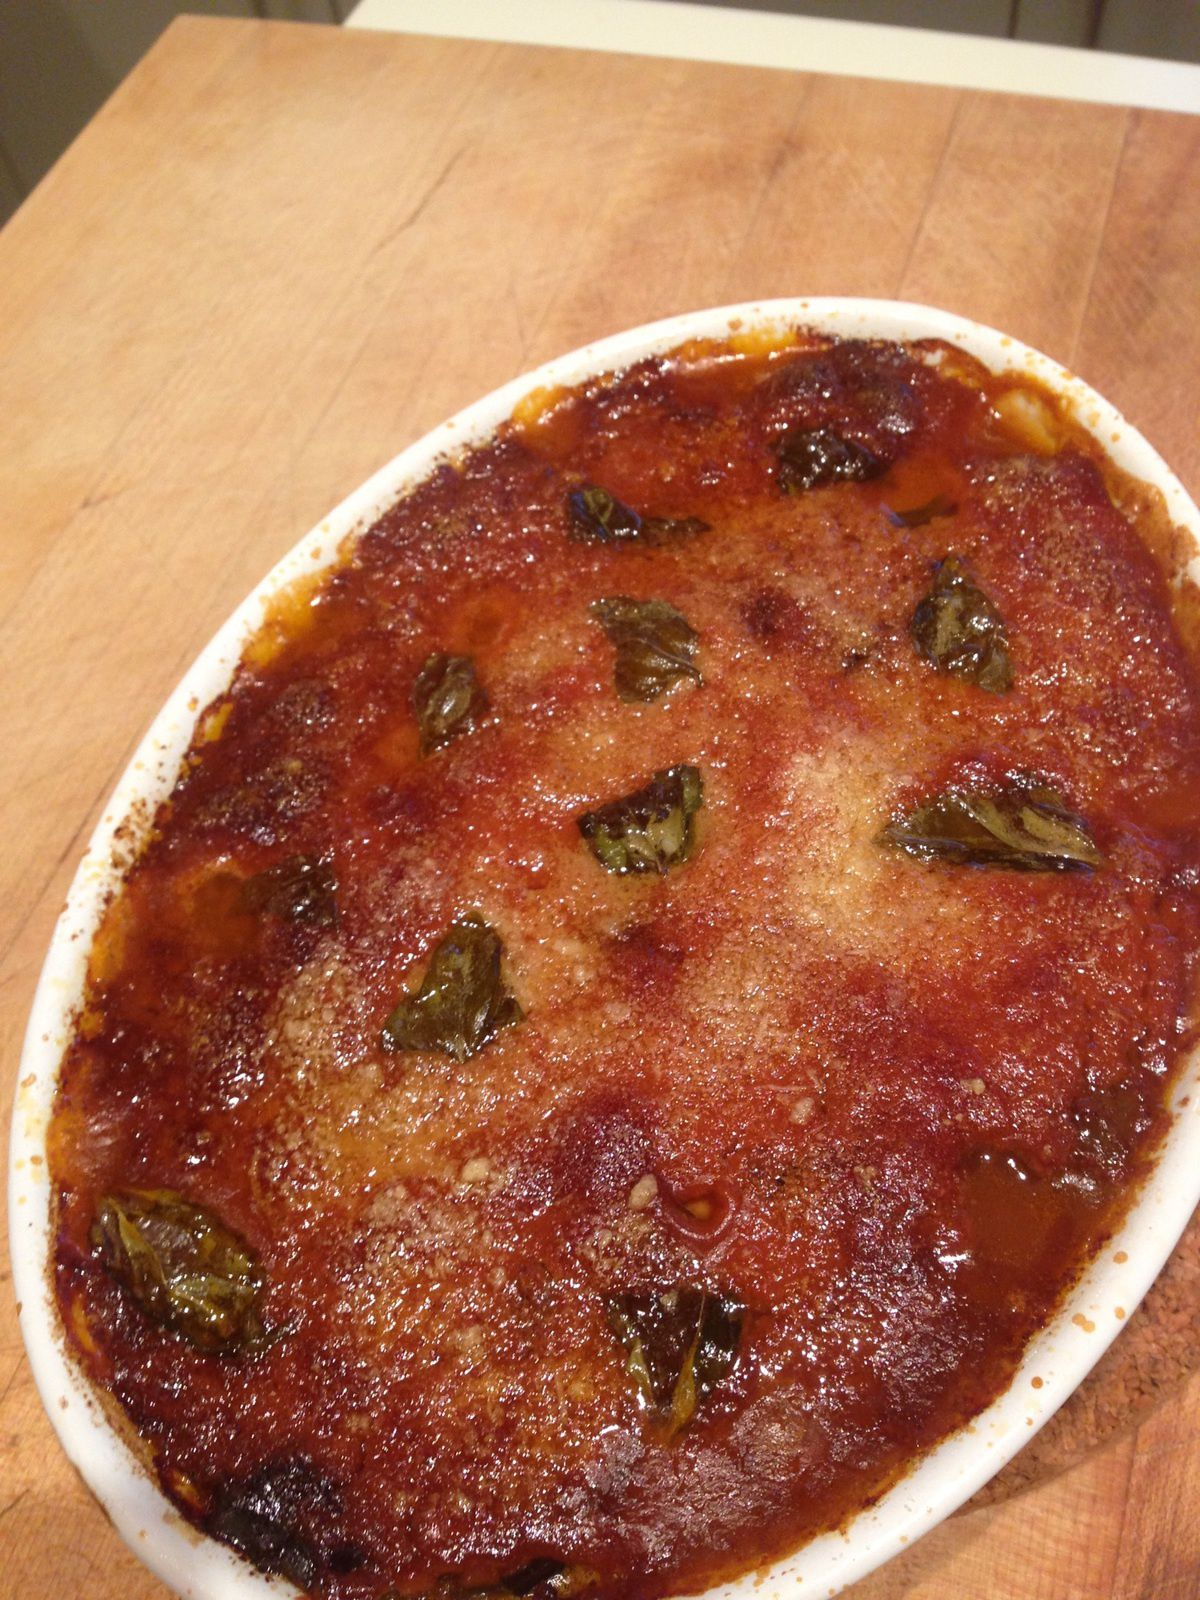 Melanzane alla parmigiana : aubergines au parmesan